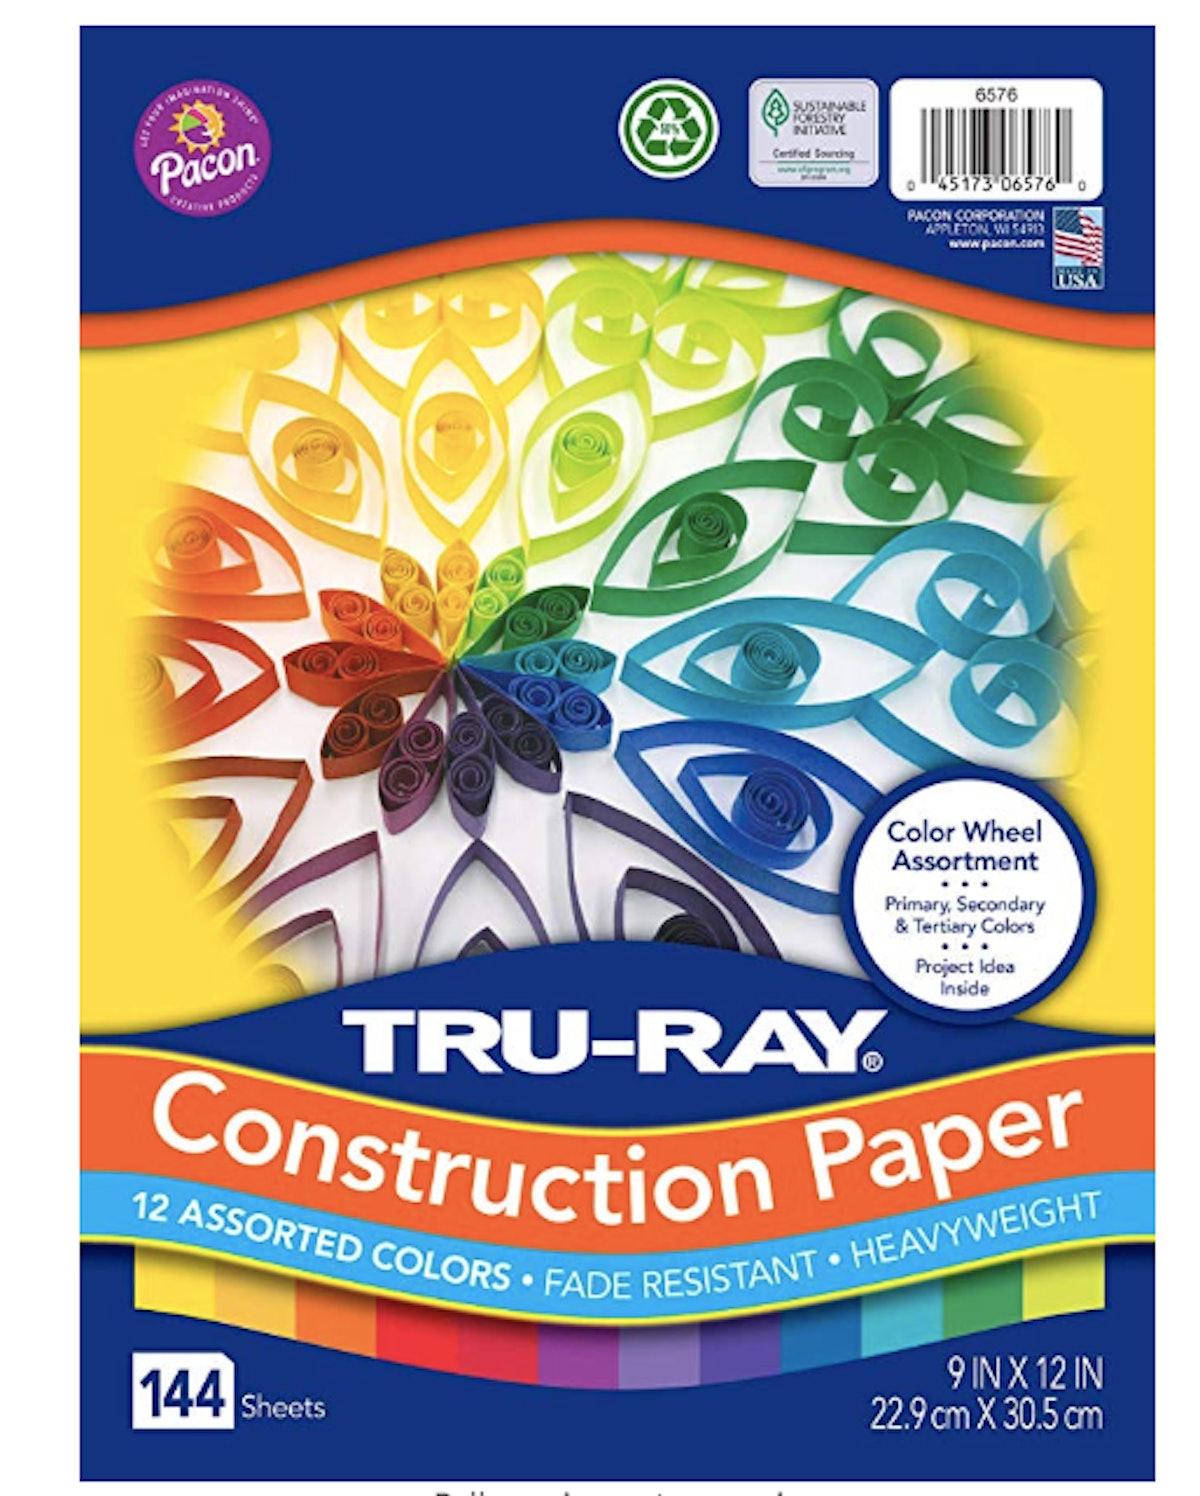 "Tru-Ray Heavyweight Construction Paper, Color Wheel Assortment, 9""x12"", 144 Sheets"